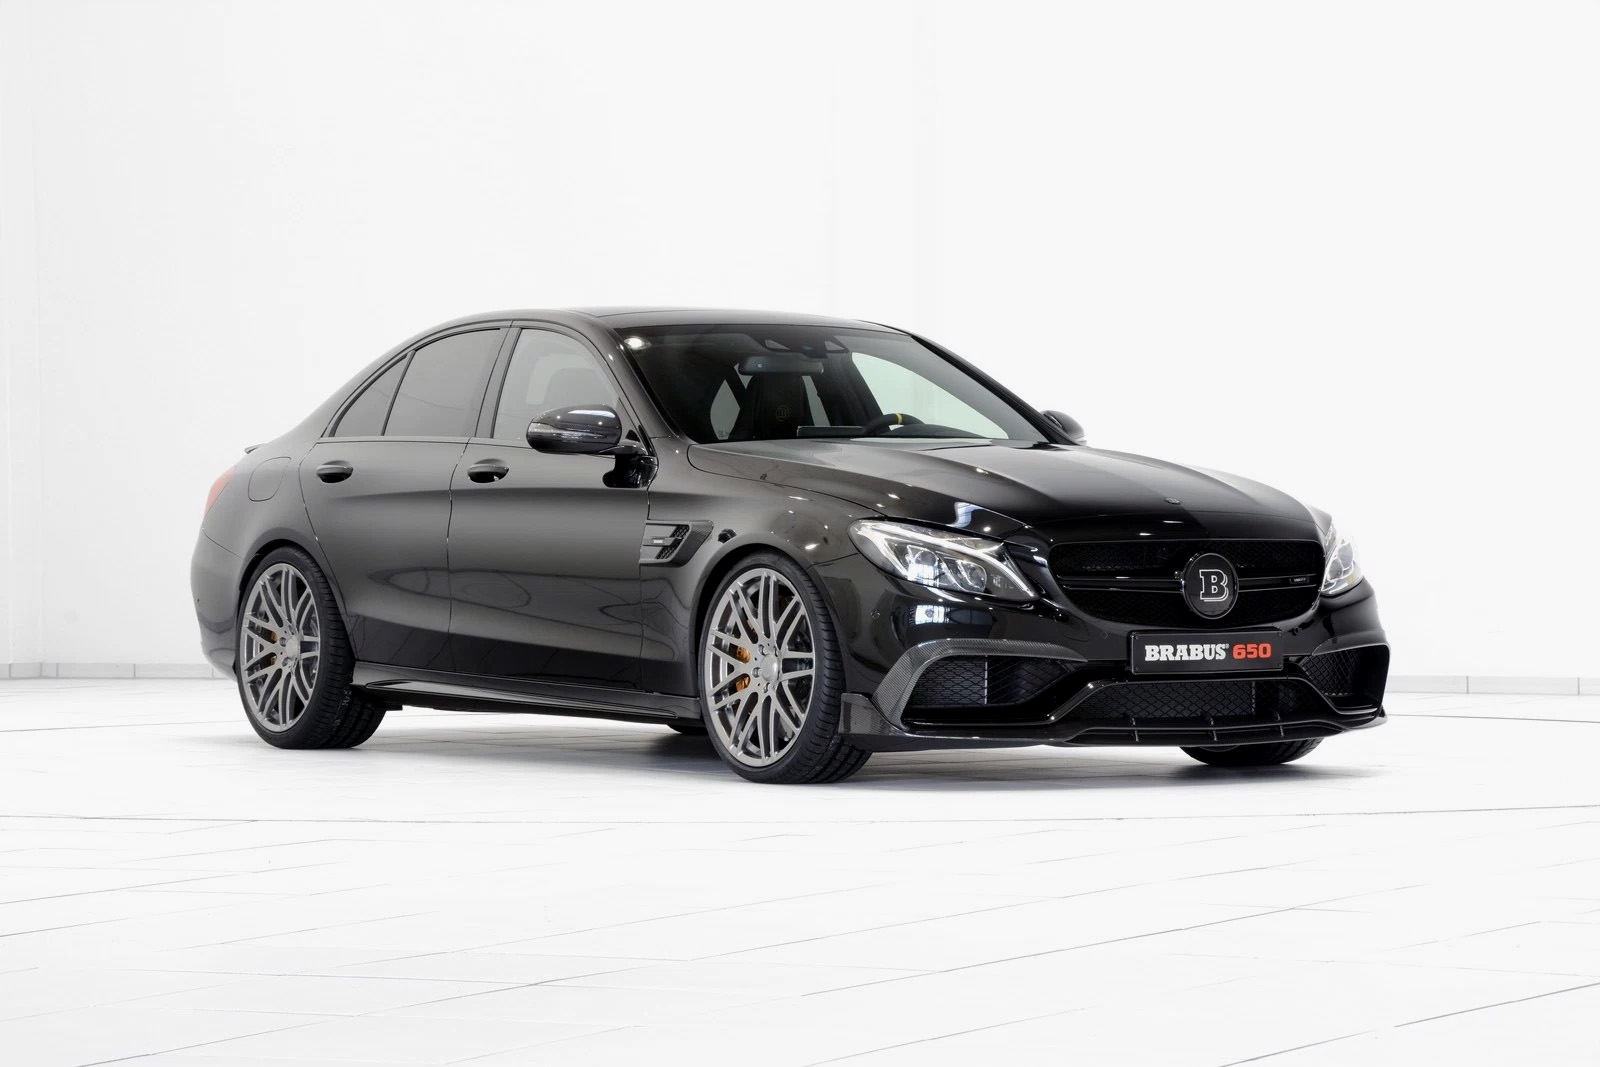 Brabus Unveils Its 641 Horsepower Mercedes-AMG C63 S